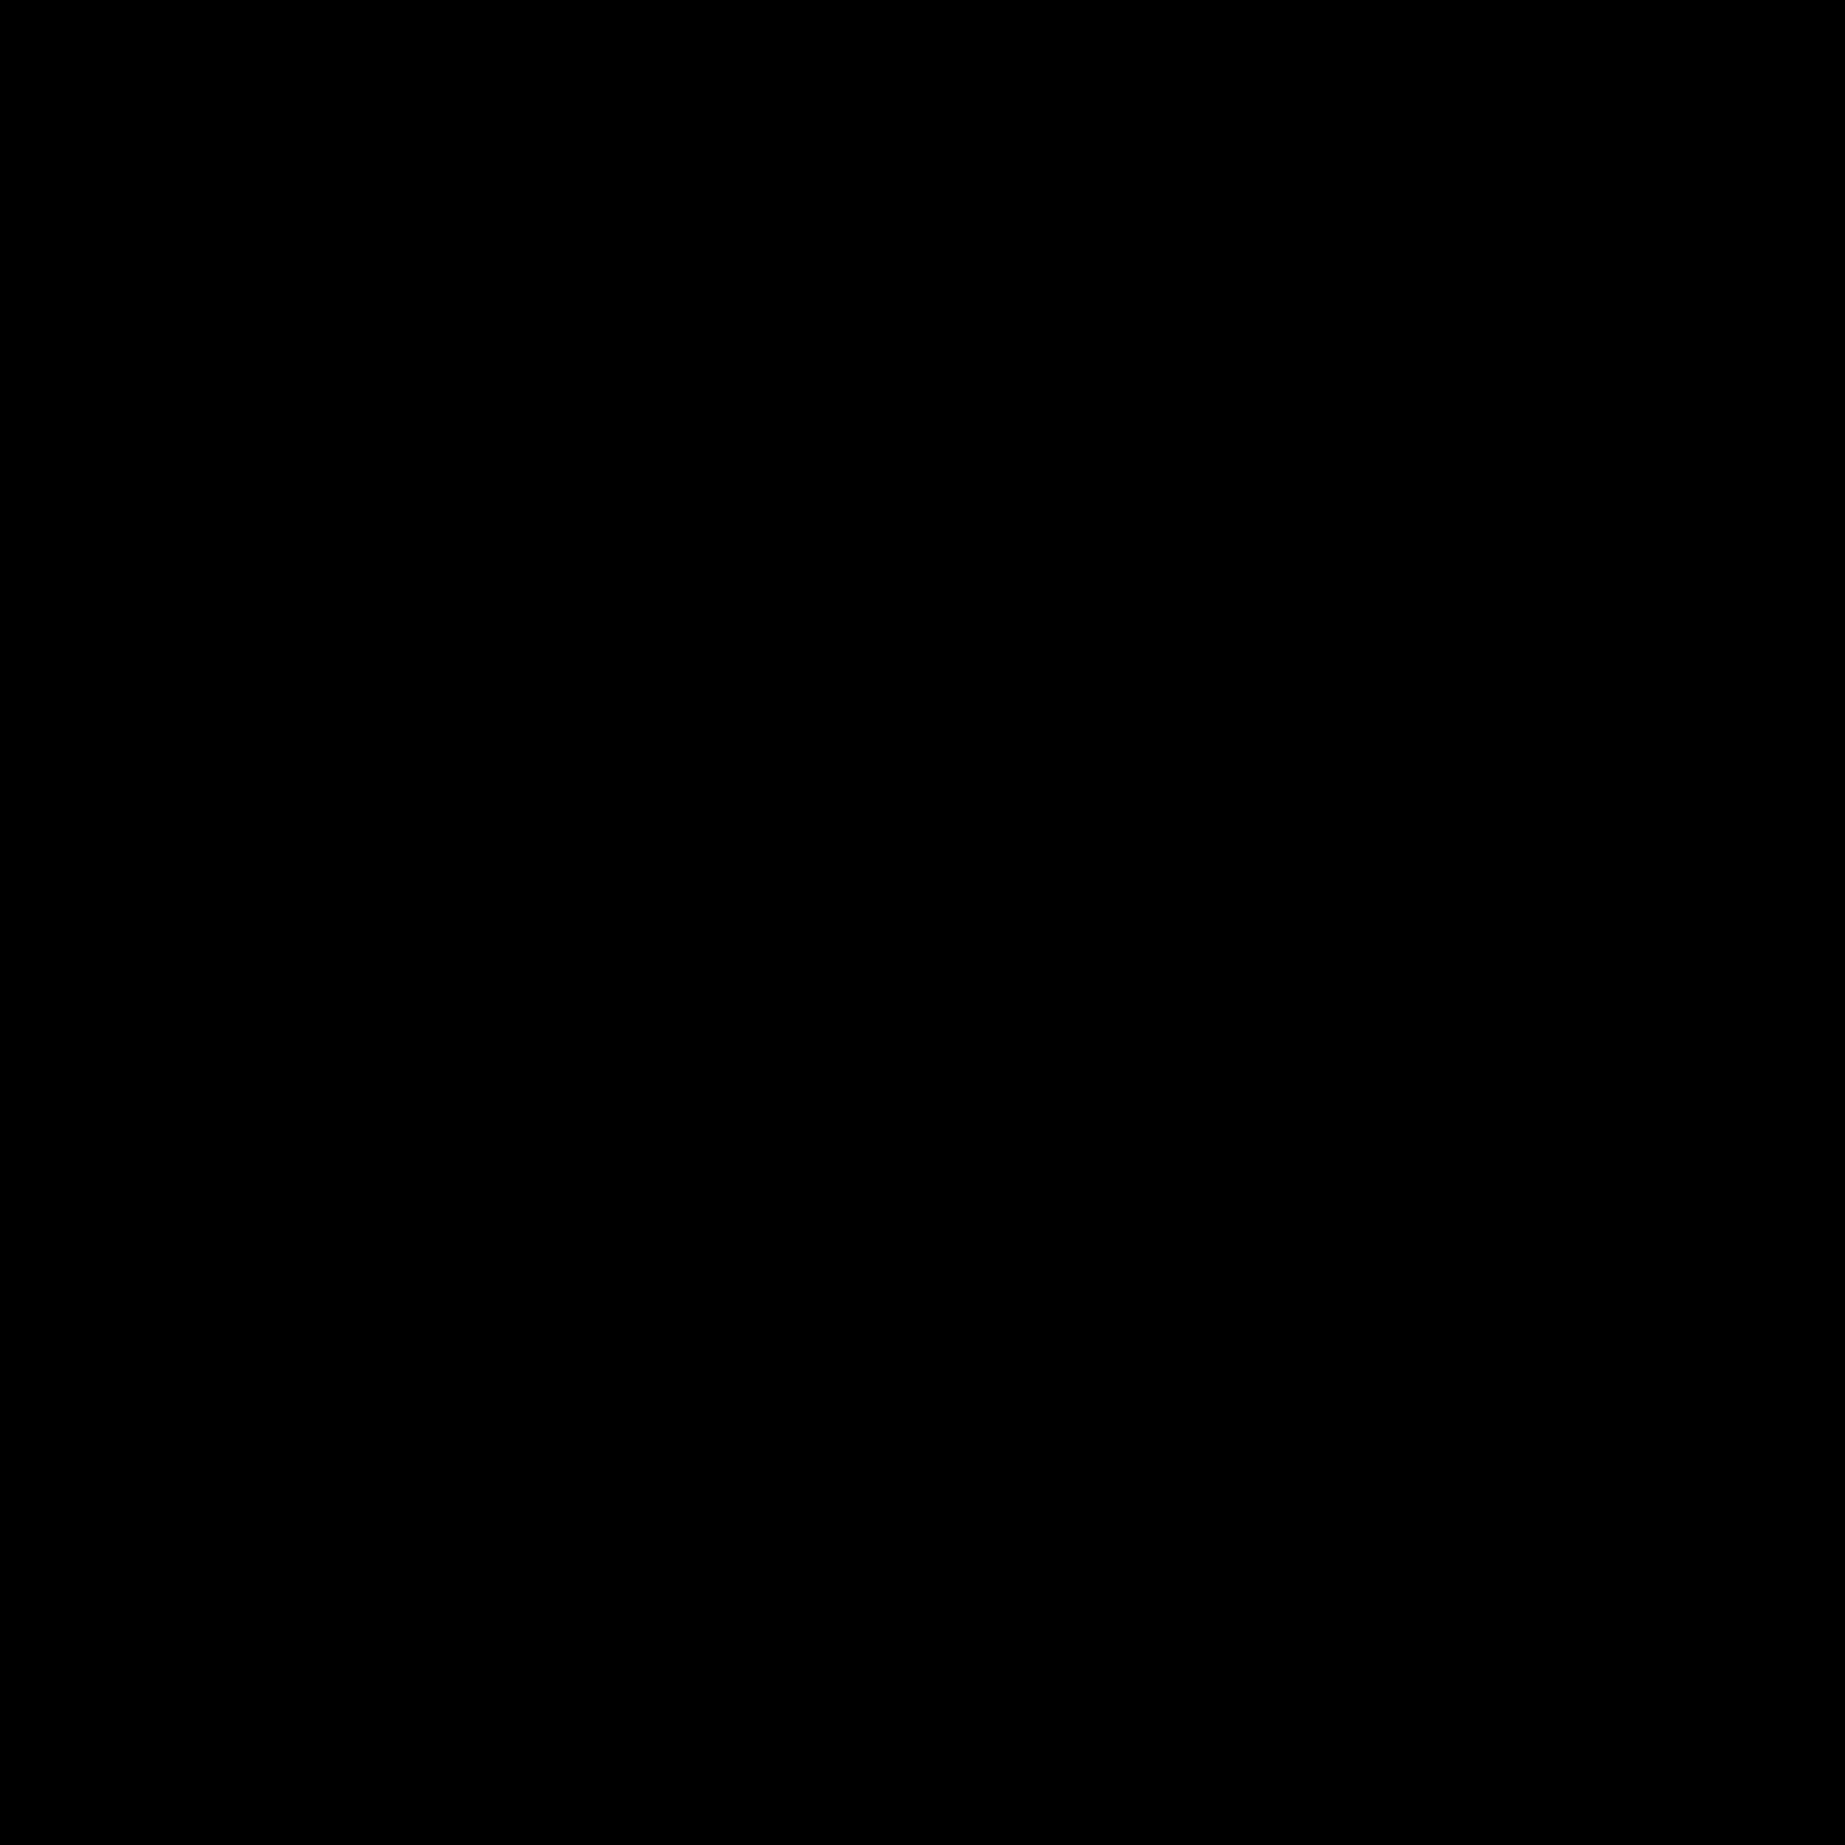 file4-10